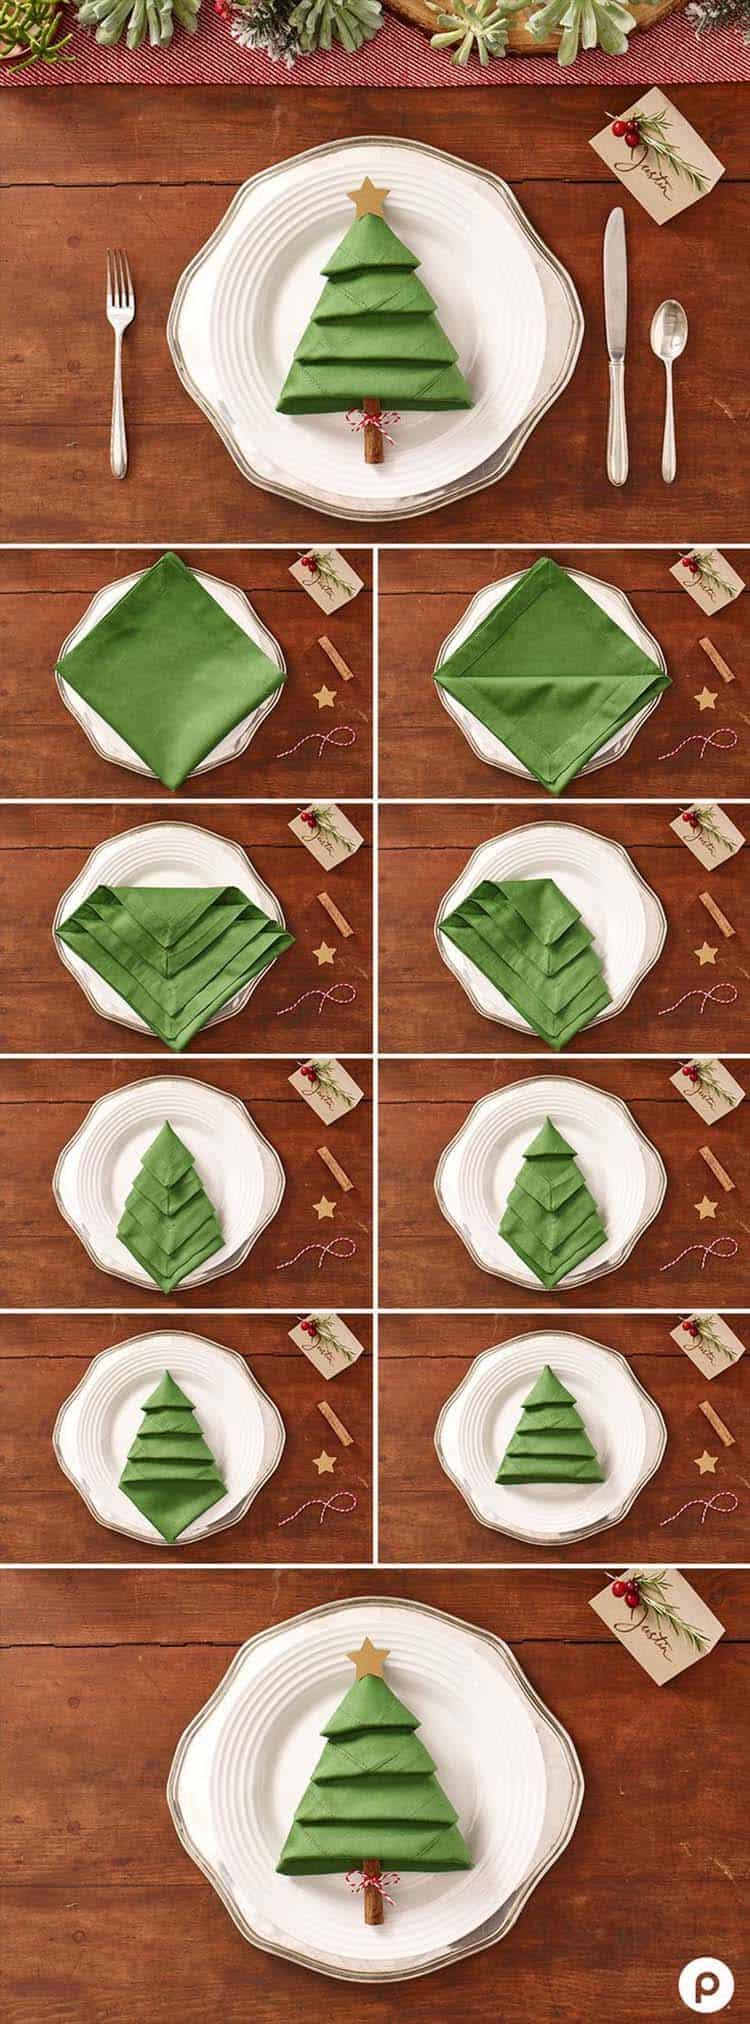 Inspiring Dining Table Christmas Decor Ideas-11-1 Kindesign